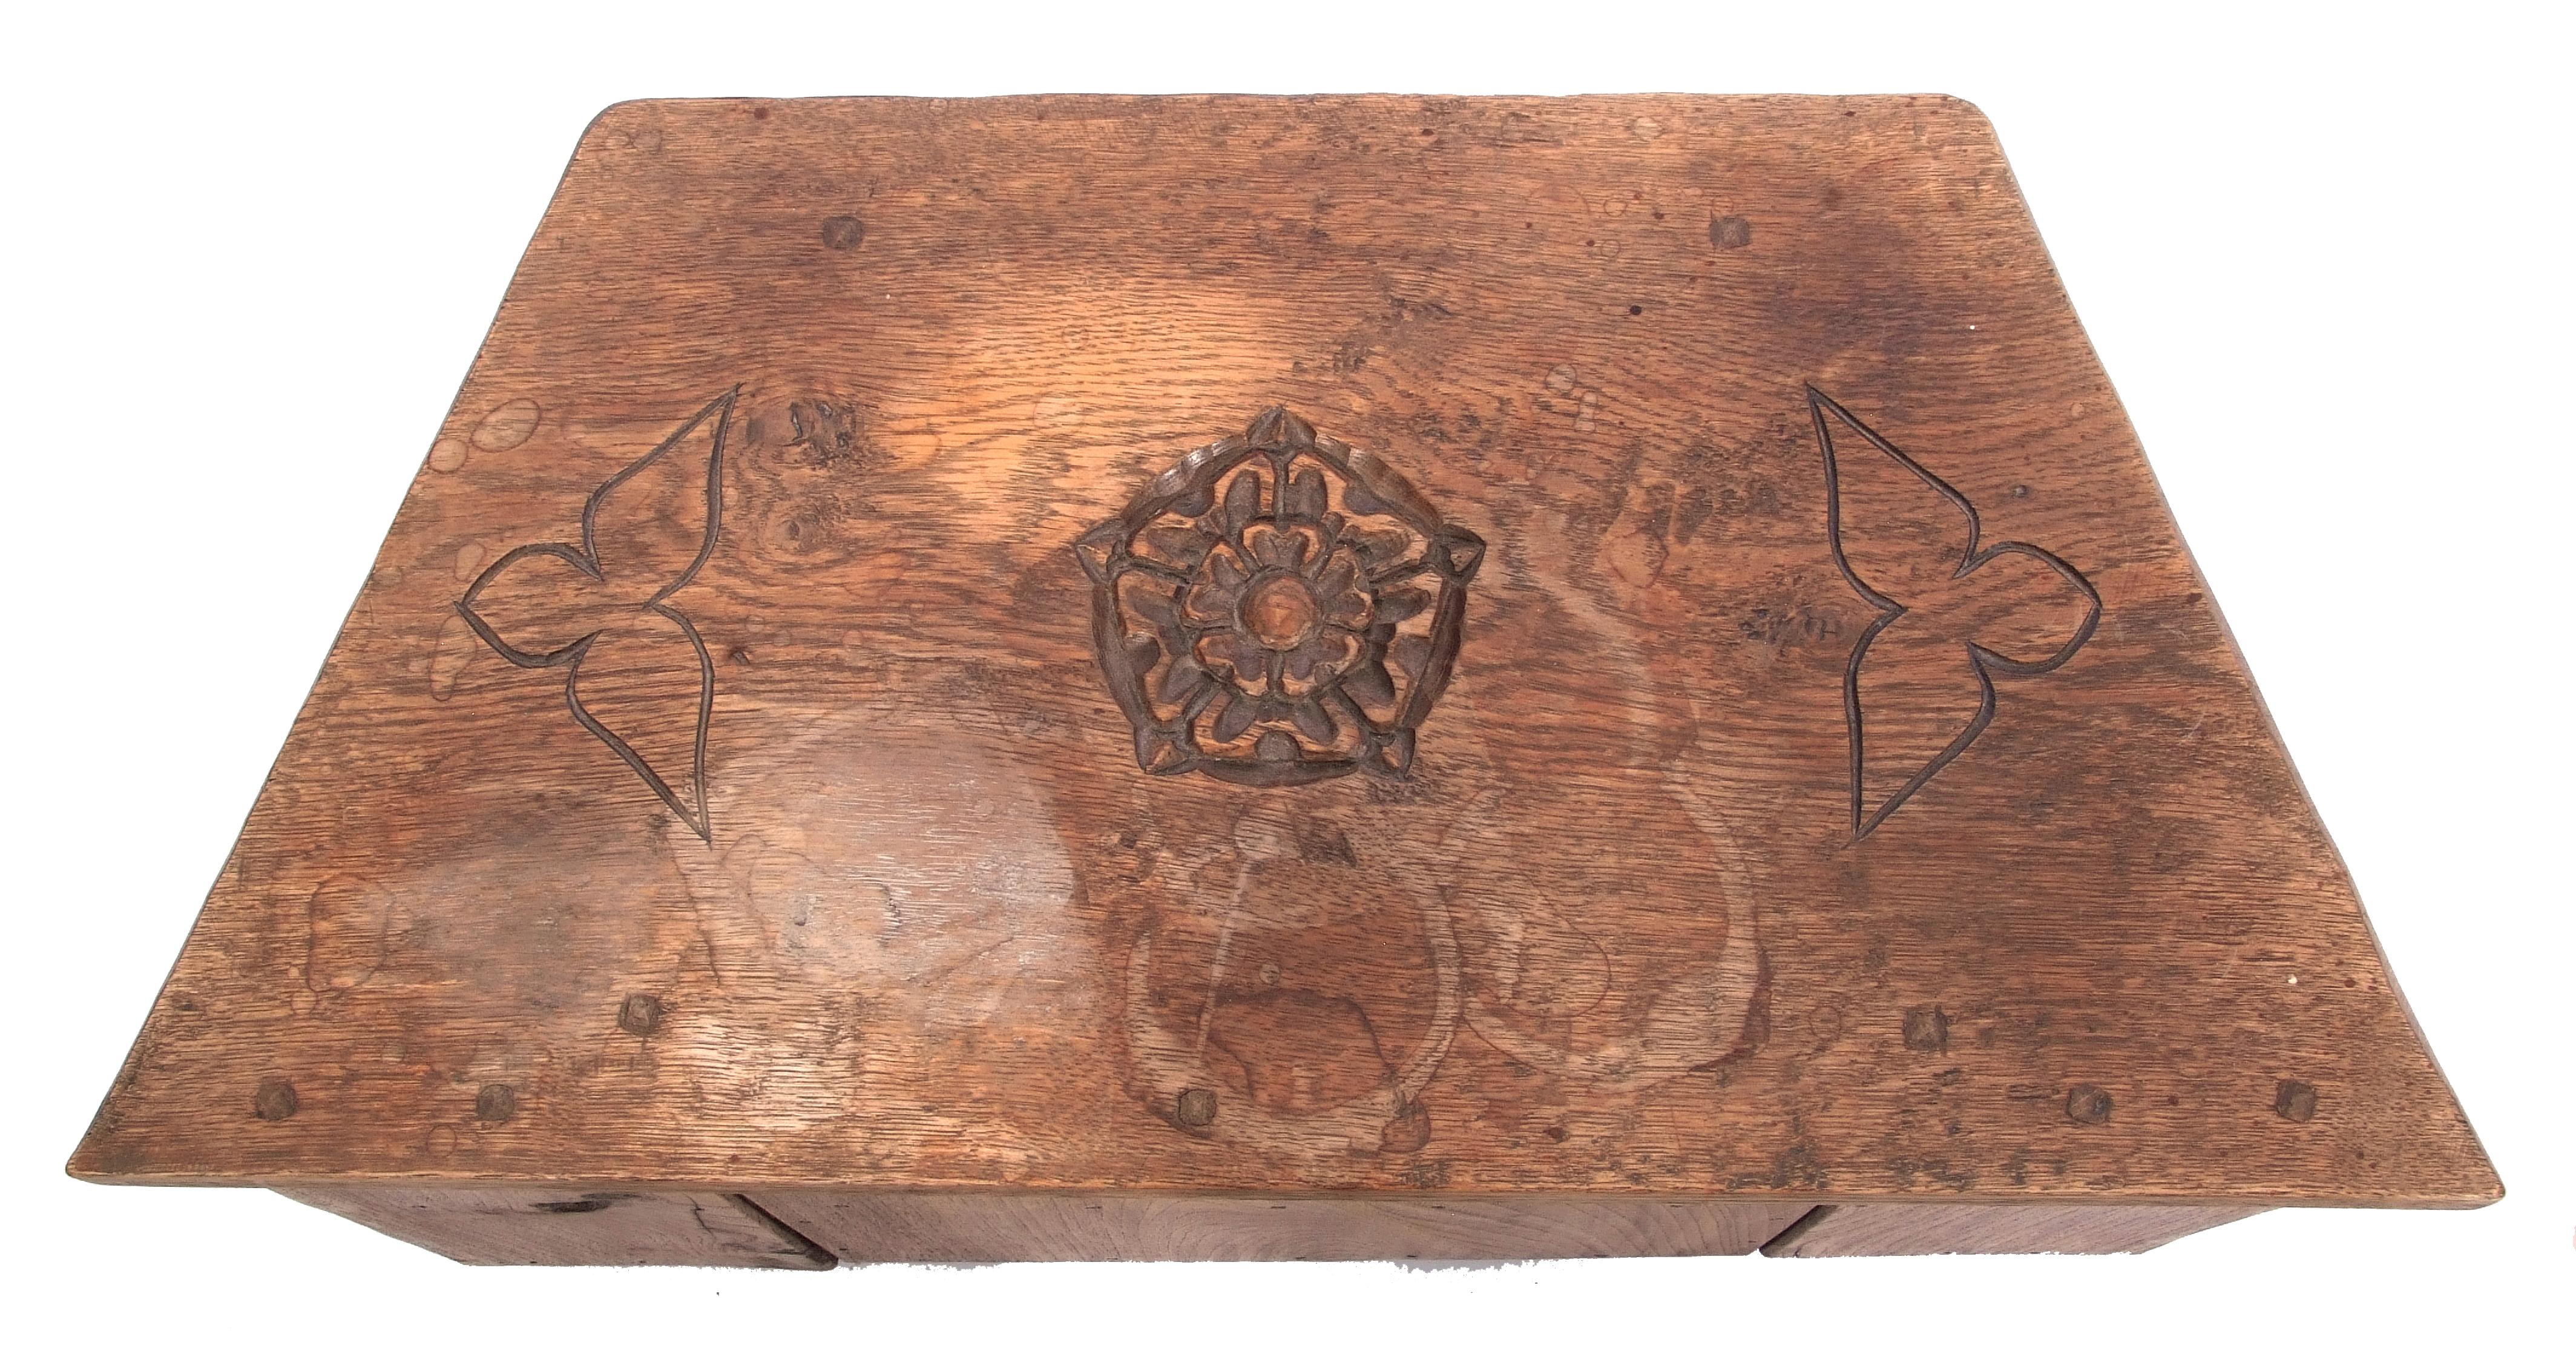 Jack Grimble of Cromer, a small oak losenge shaped side table with carved Tudor Rose detail 76cm - Image 9 of 10